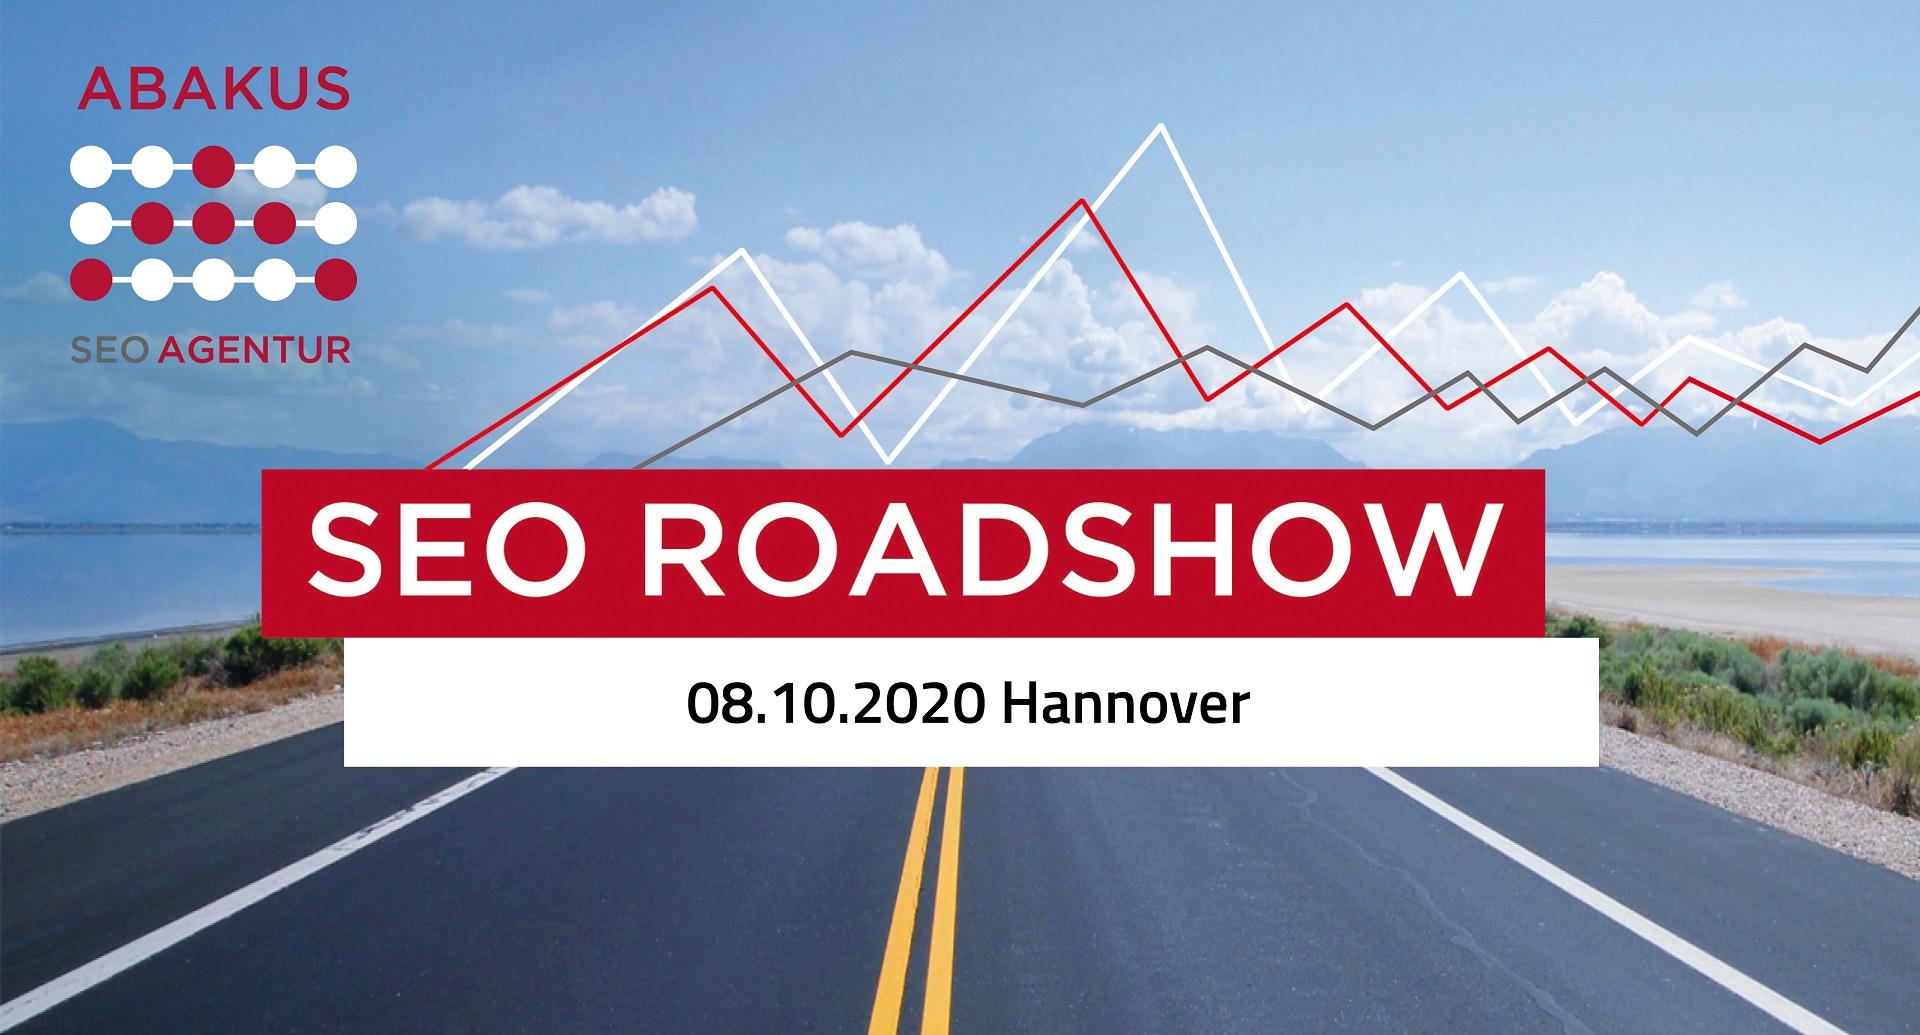 SEO Roadshow Hannover 2020